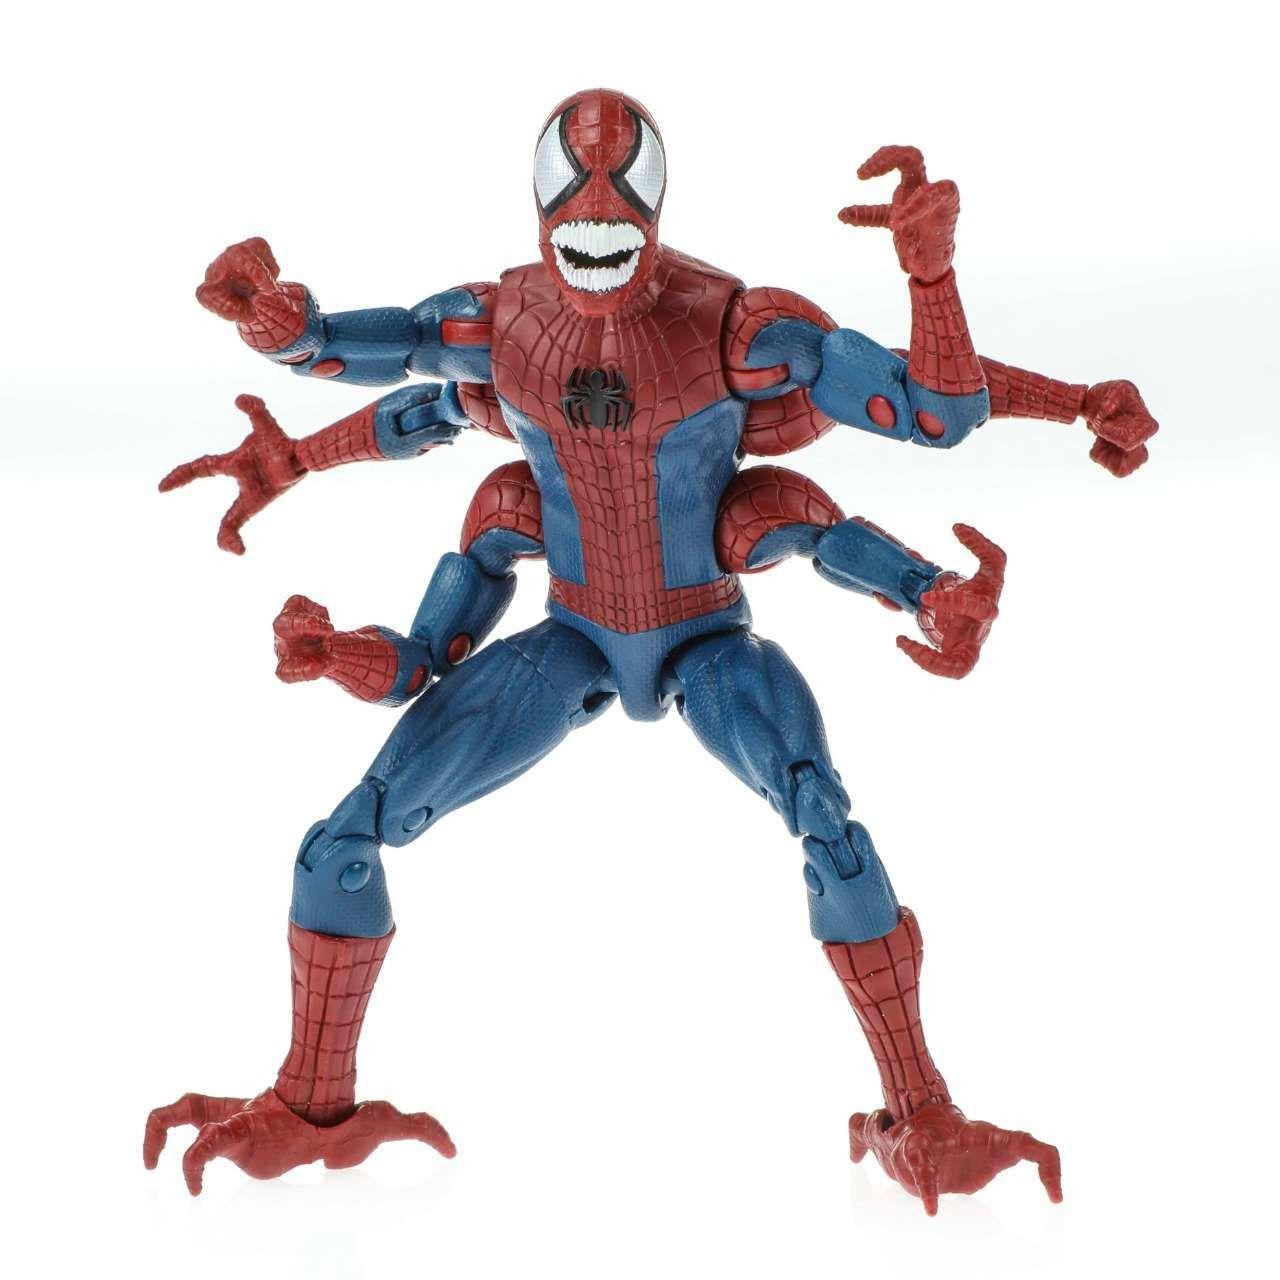 Action Figure Contraparte Aranha (Doppelganger Spider-Man): Homem-Aranha (Spider-Man) Marvel Legends Series - Hasbro